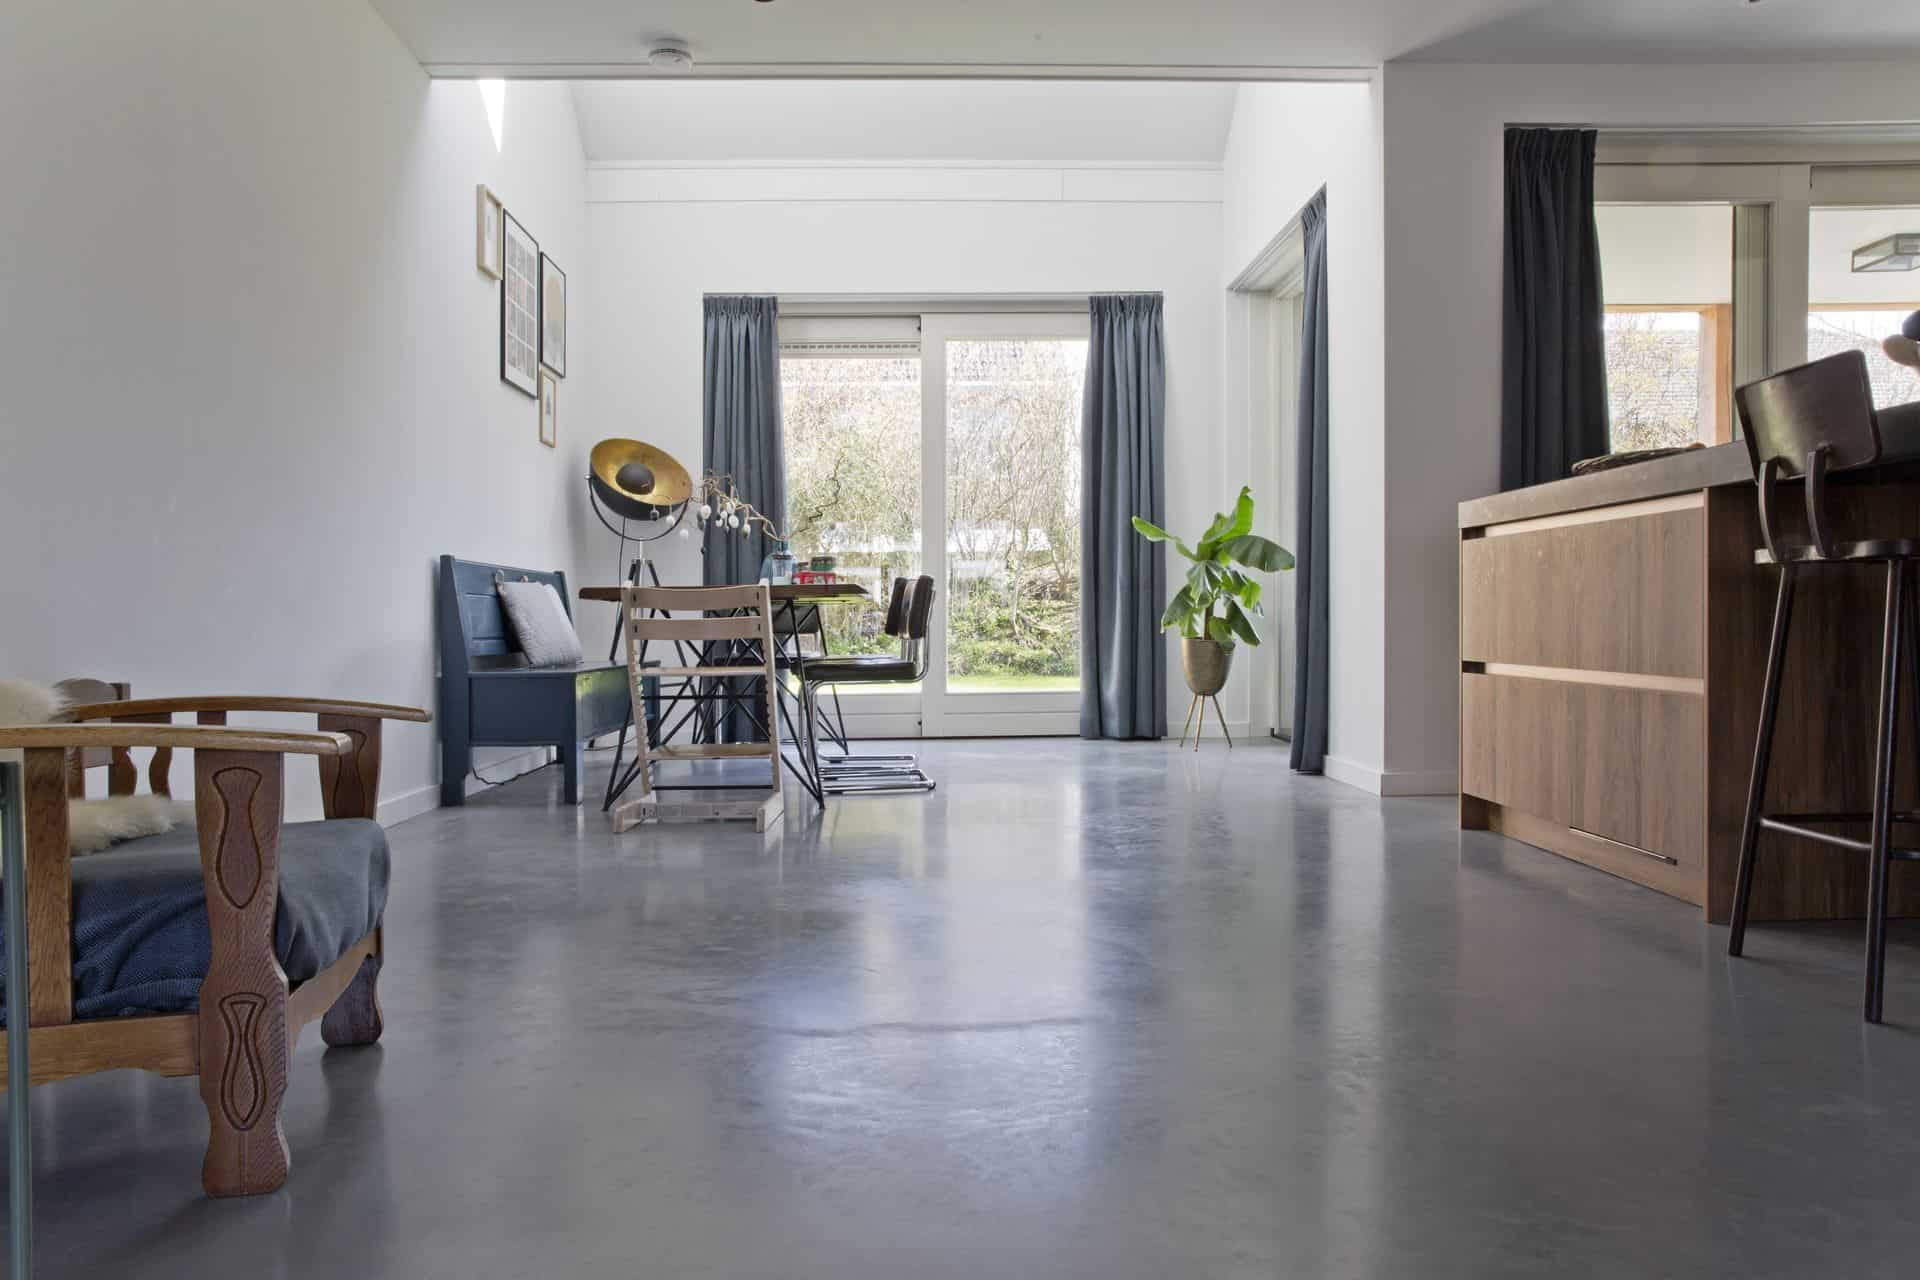 gevlinderde betonvloer, betonnen vloer gevlinderd